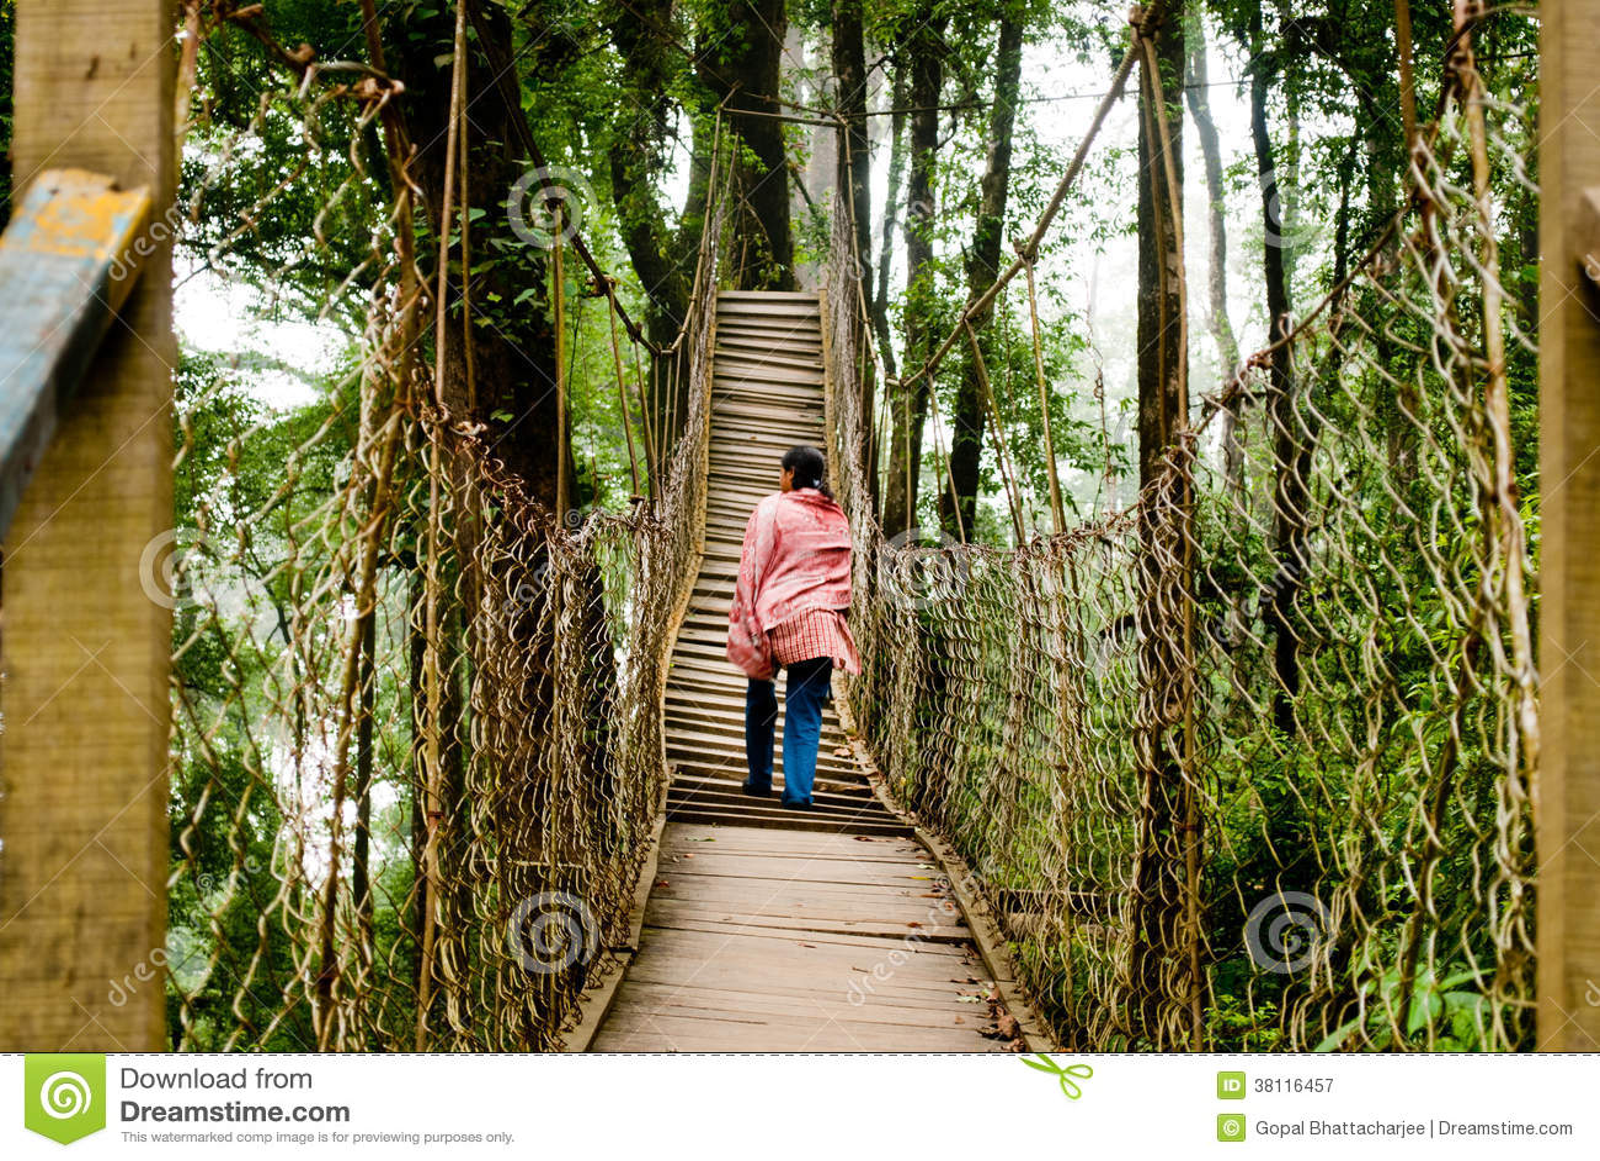 The Canopy Walk Way